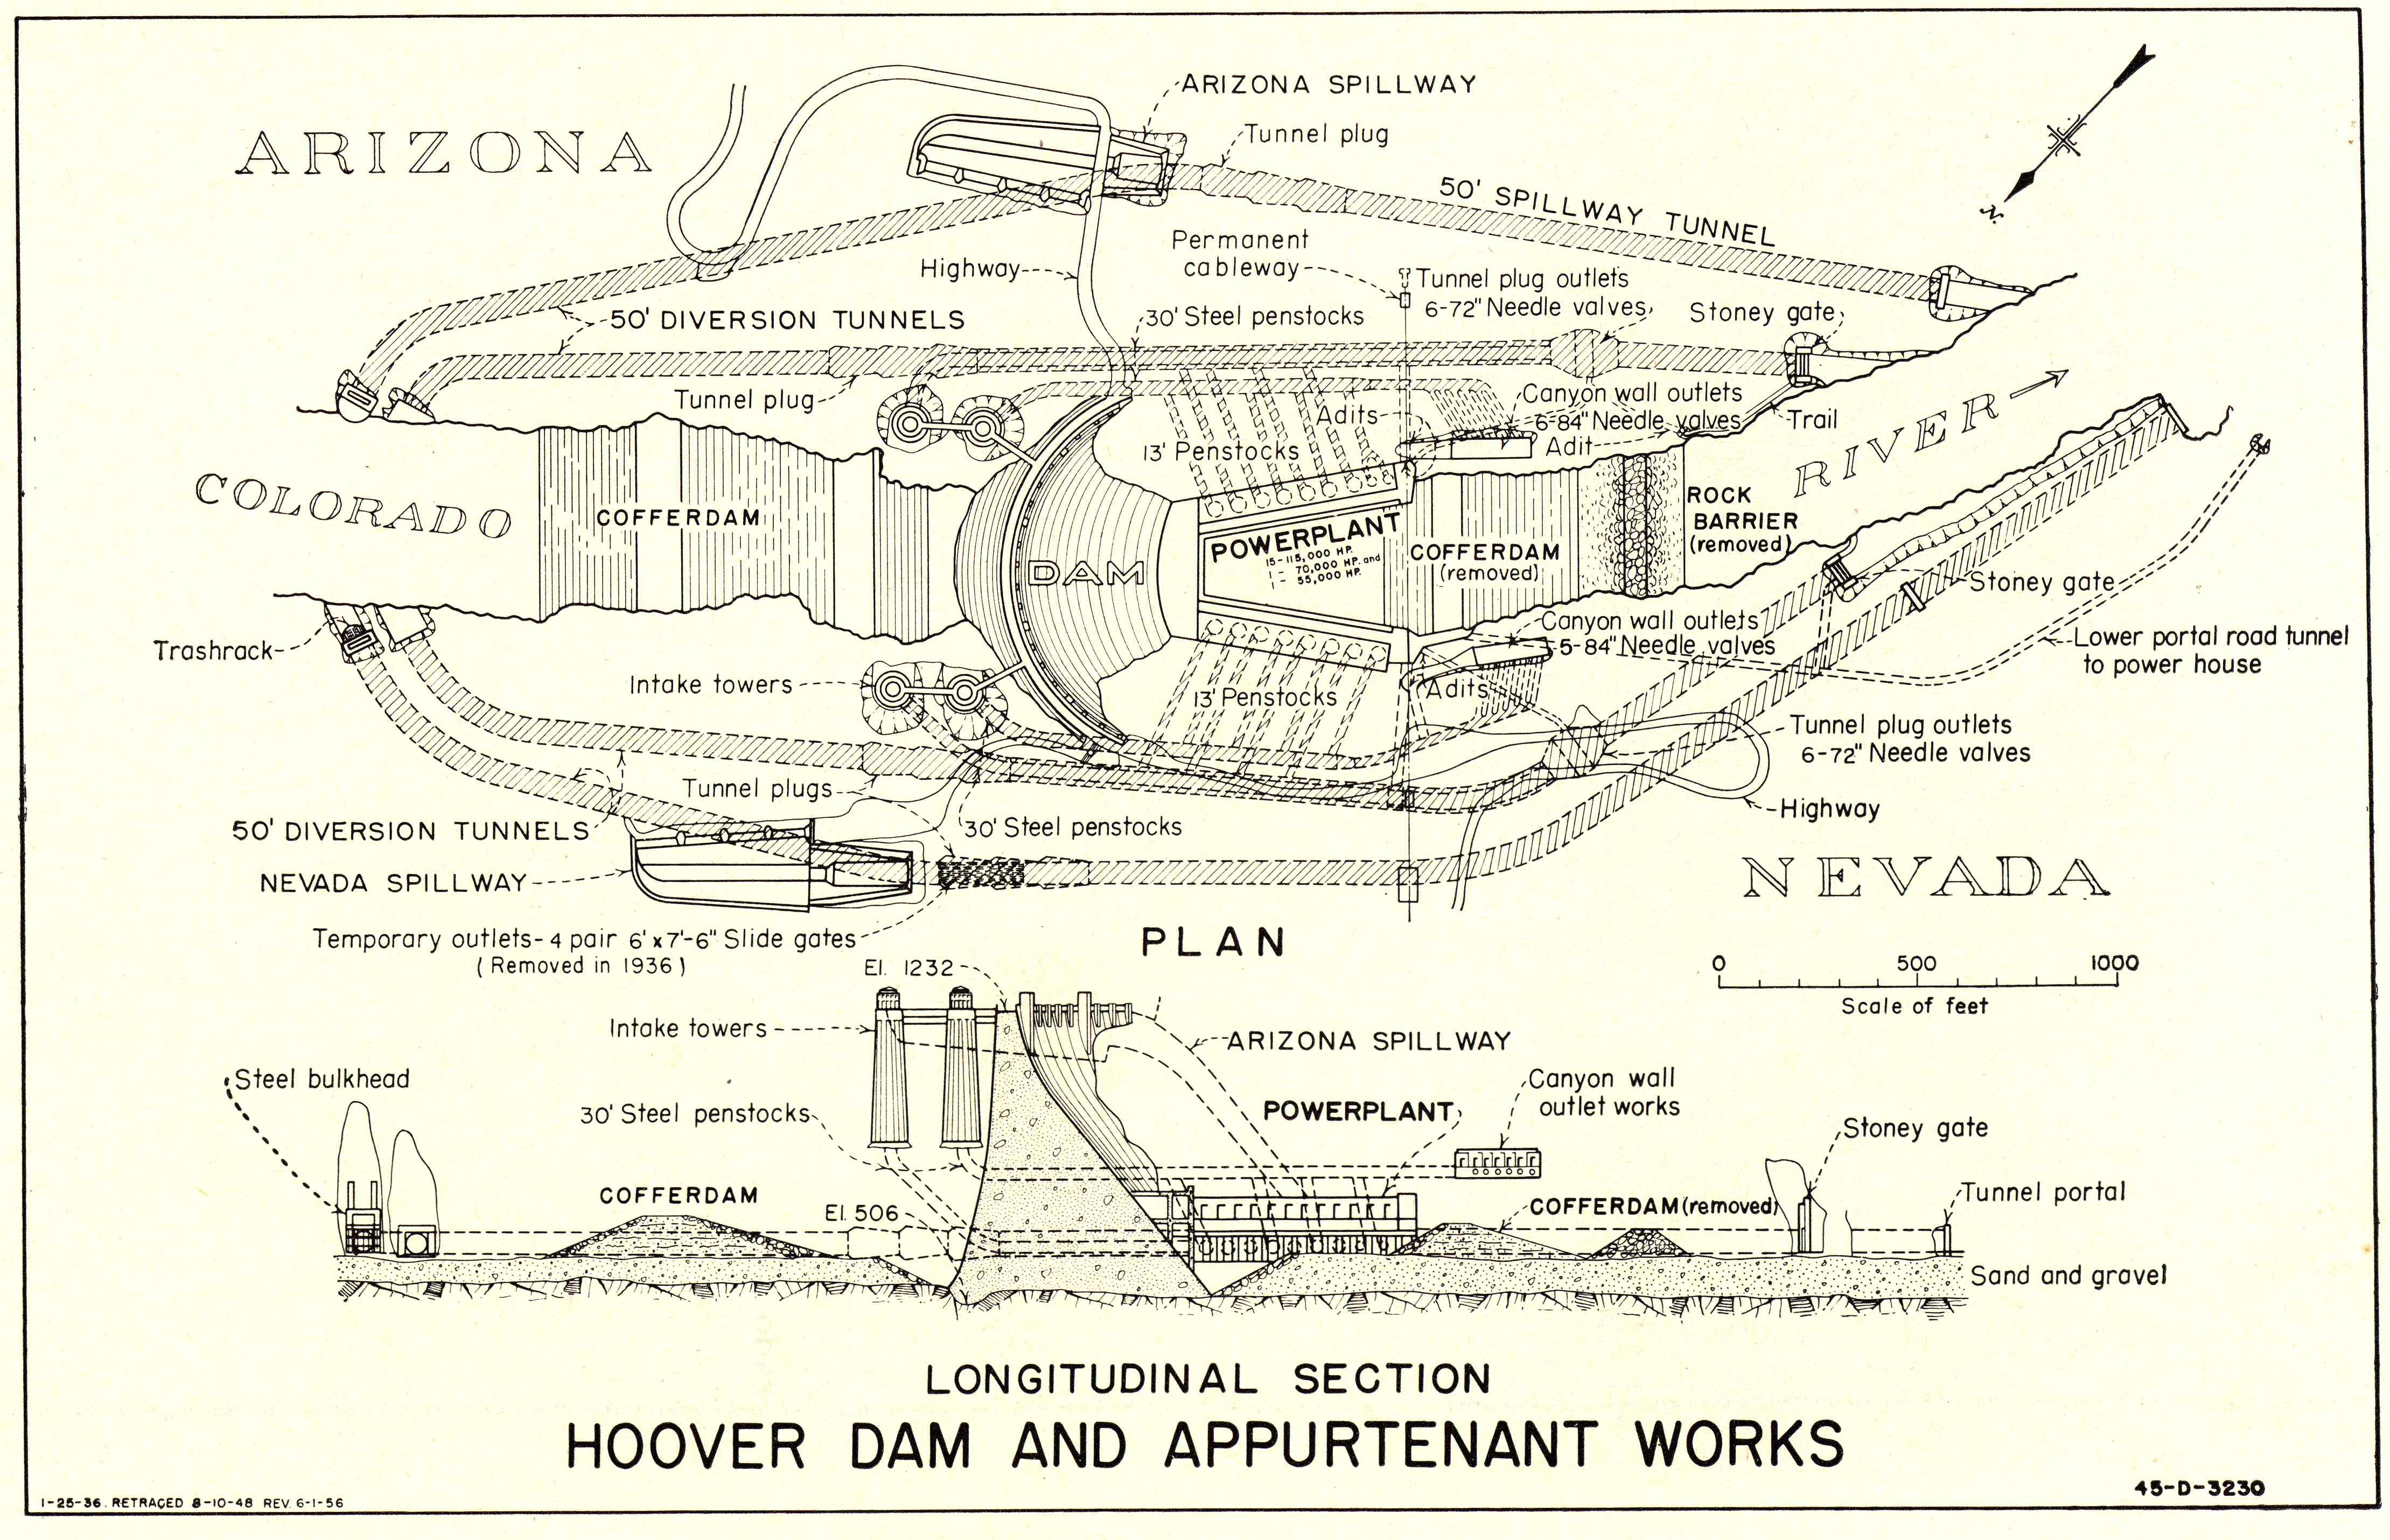 File:Hoover-summary-map.jpg